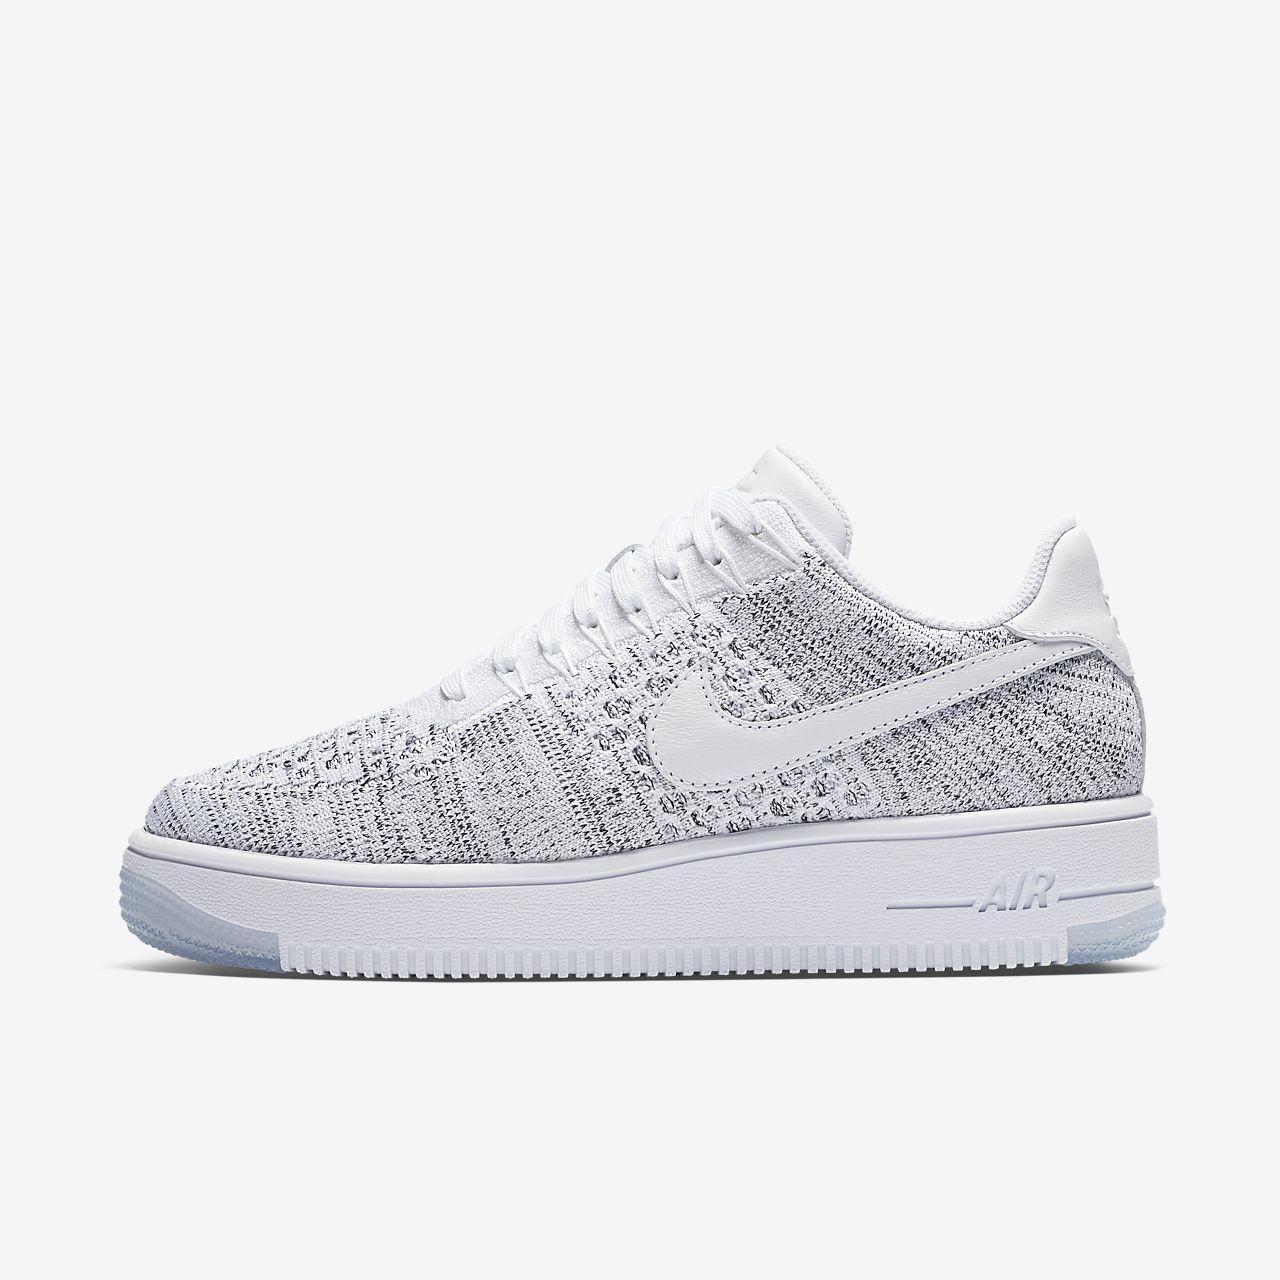 Air Force 1 07 Premium - Chaussures - Bas-tops Et Baskets Nike K4QePy10xl